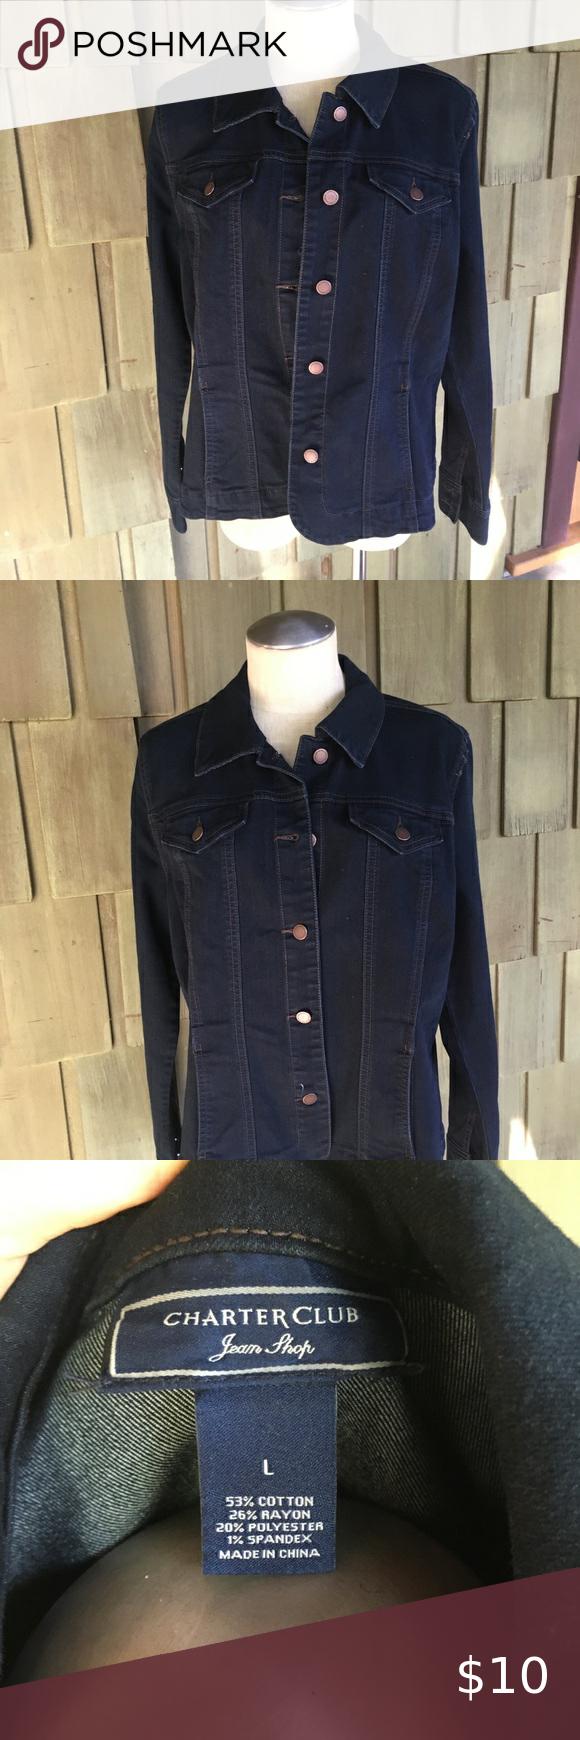 Charter Club Cobalt Dark Denim Blue Jean Jacket In 2020 Dark Denim Blue Jean Jacket Blue Denim [ 1740 x 580 Pixel ]